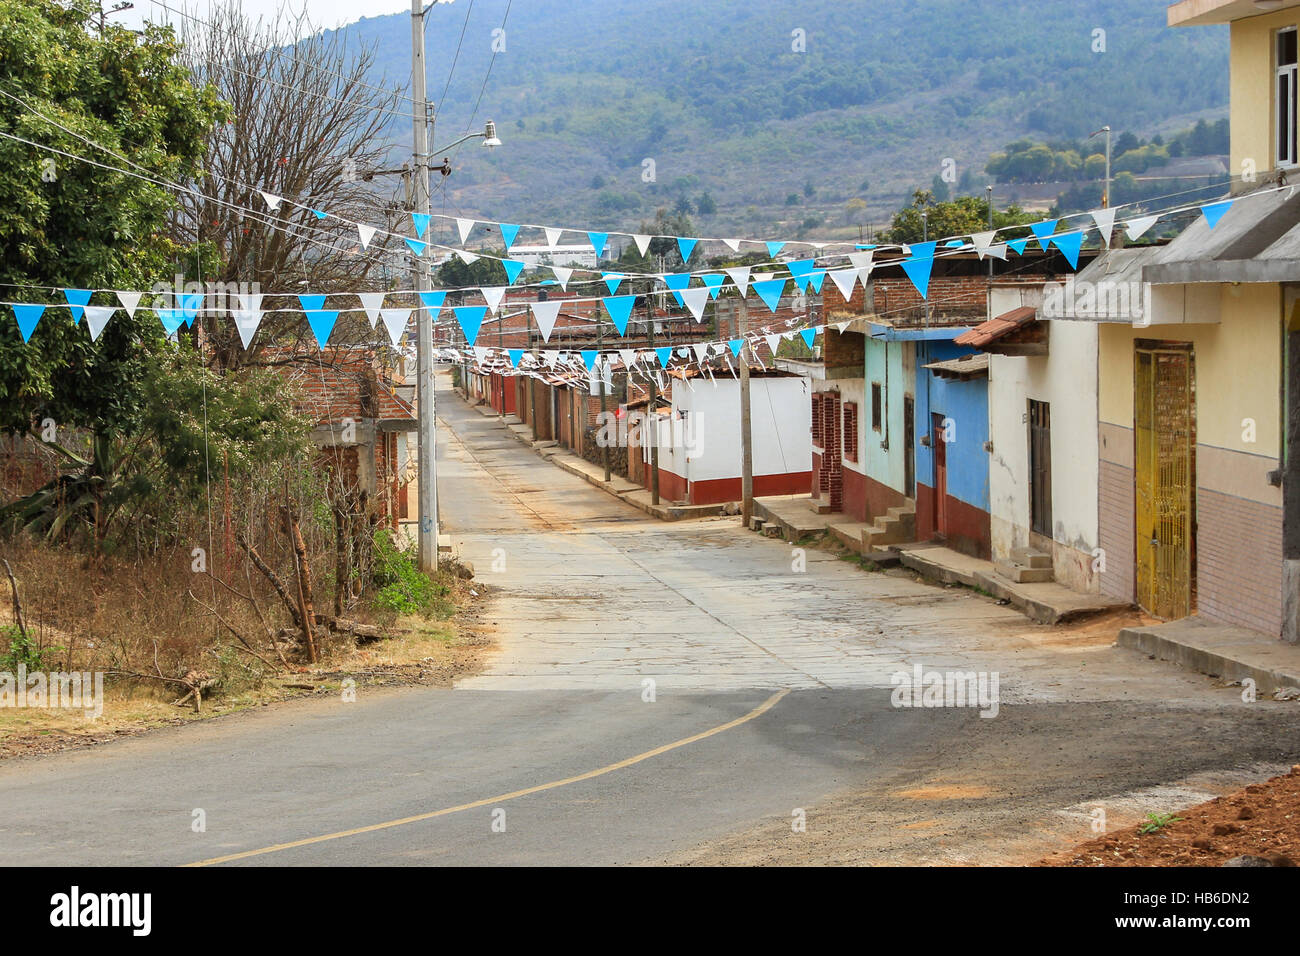 A street of Tzintzuntzan, Michoacan, Mexico - Stock Image